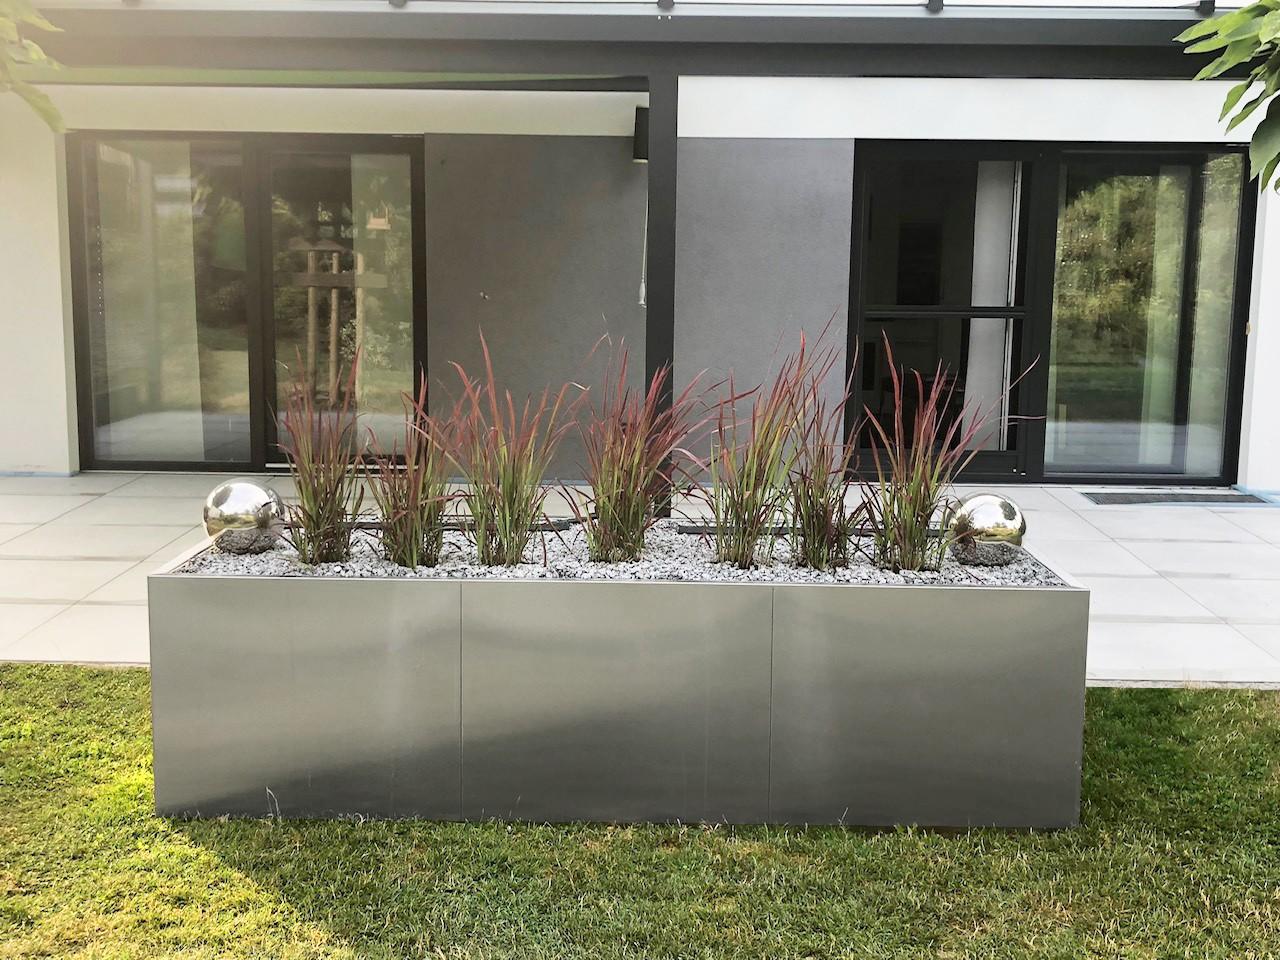 Full Size of Hochbeet Edelstahl Design Pflanzkbel Edelstahlküche Gebraucht Garten Outdoor Küche Wohnzimmer Hochbeet Edelstahl